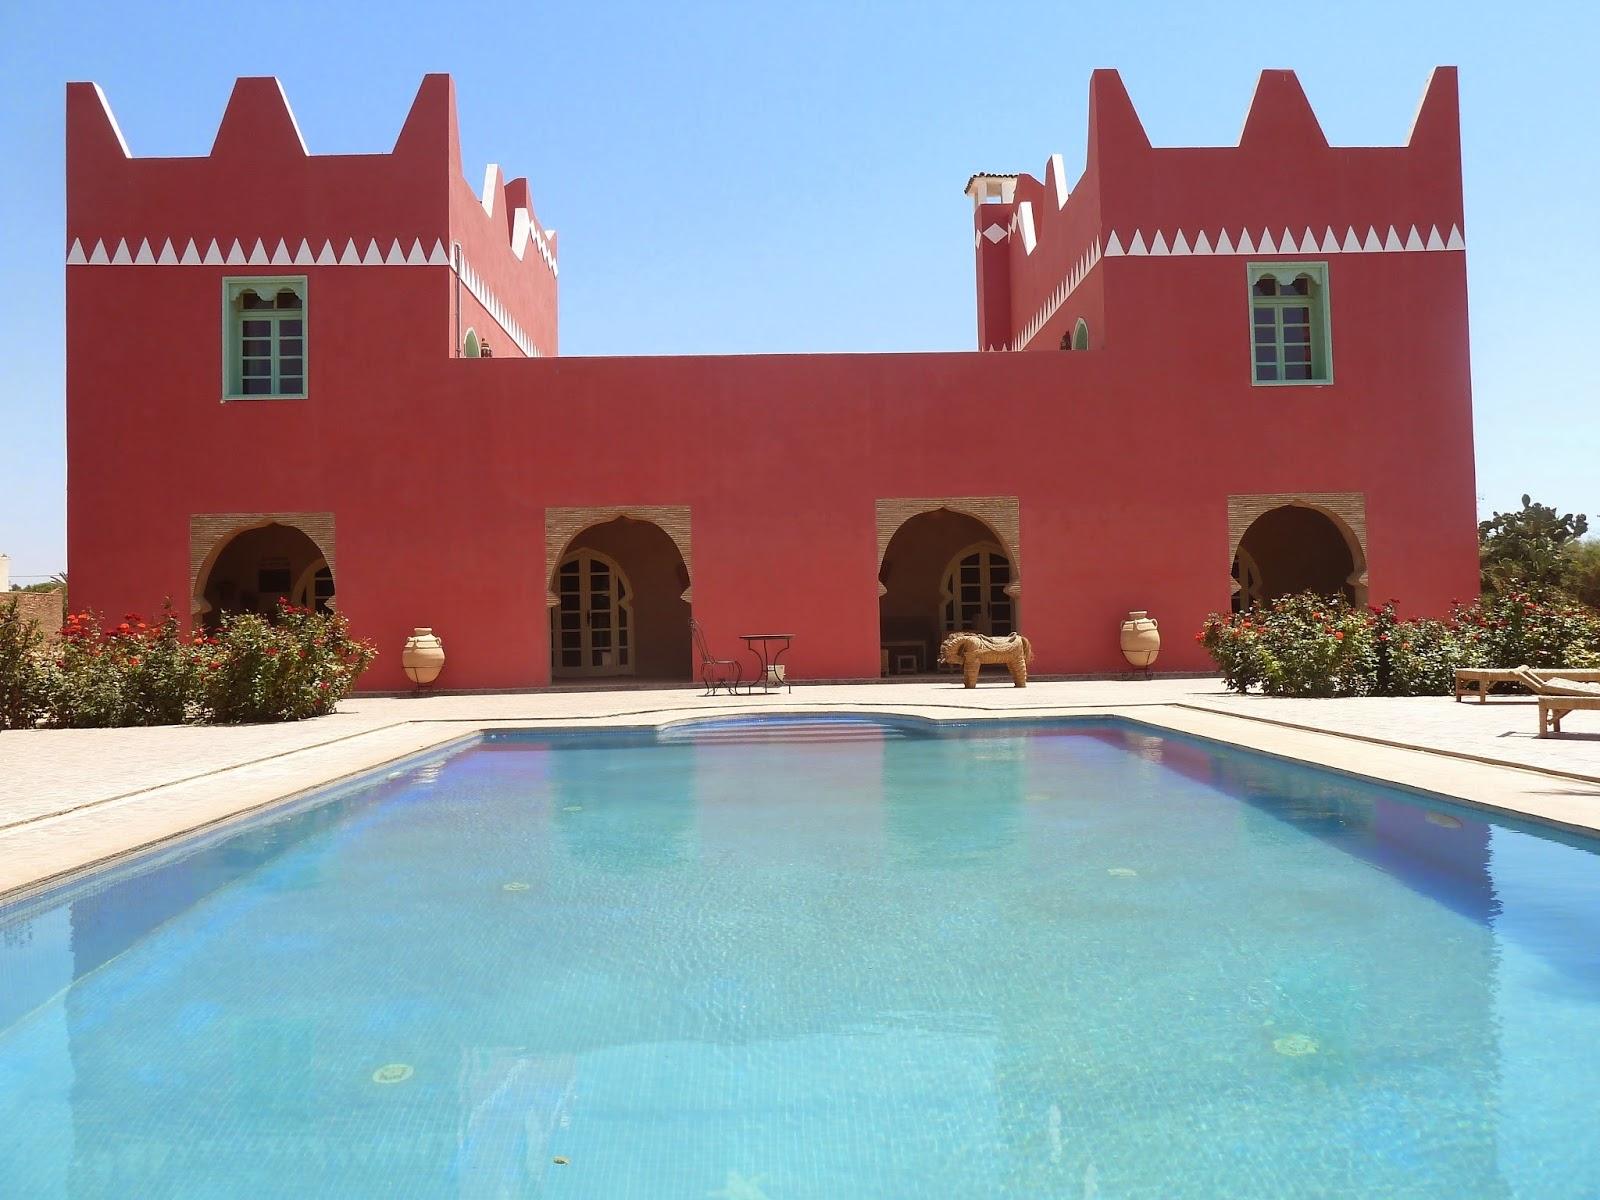 Domaine villate limoune Karte Agadir Marokko Mapcarta